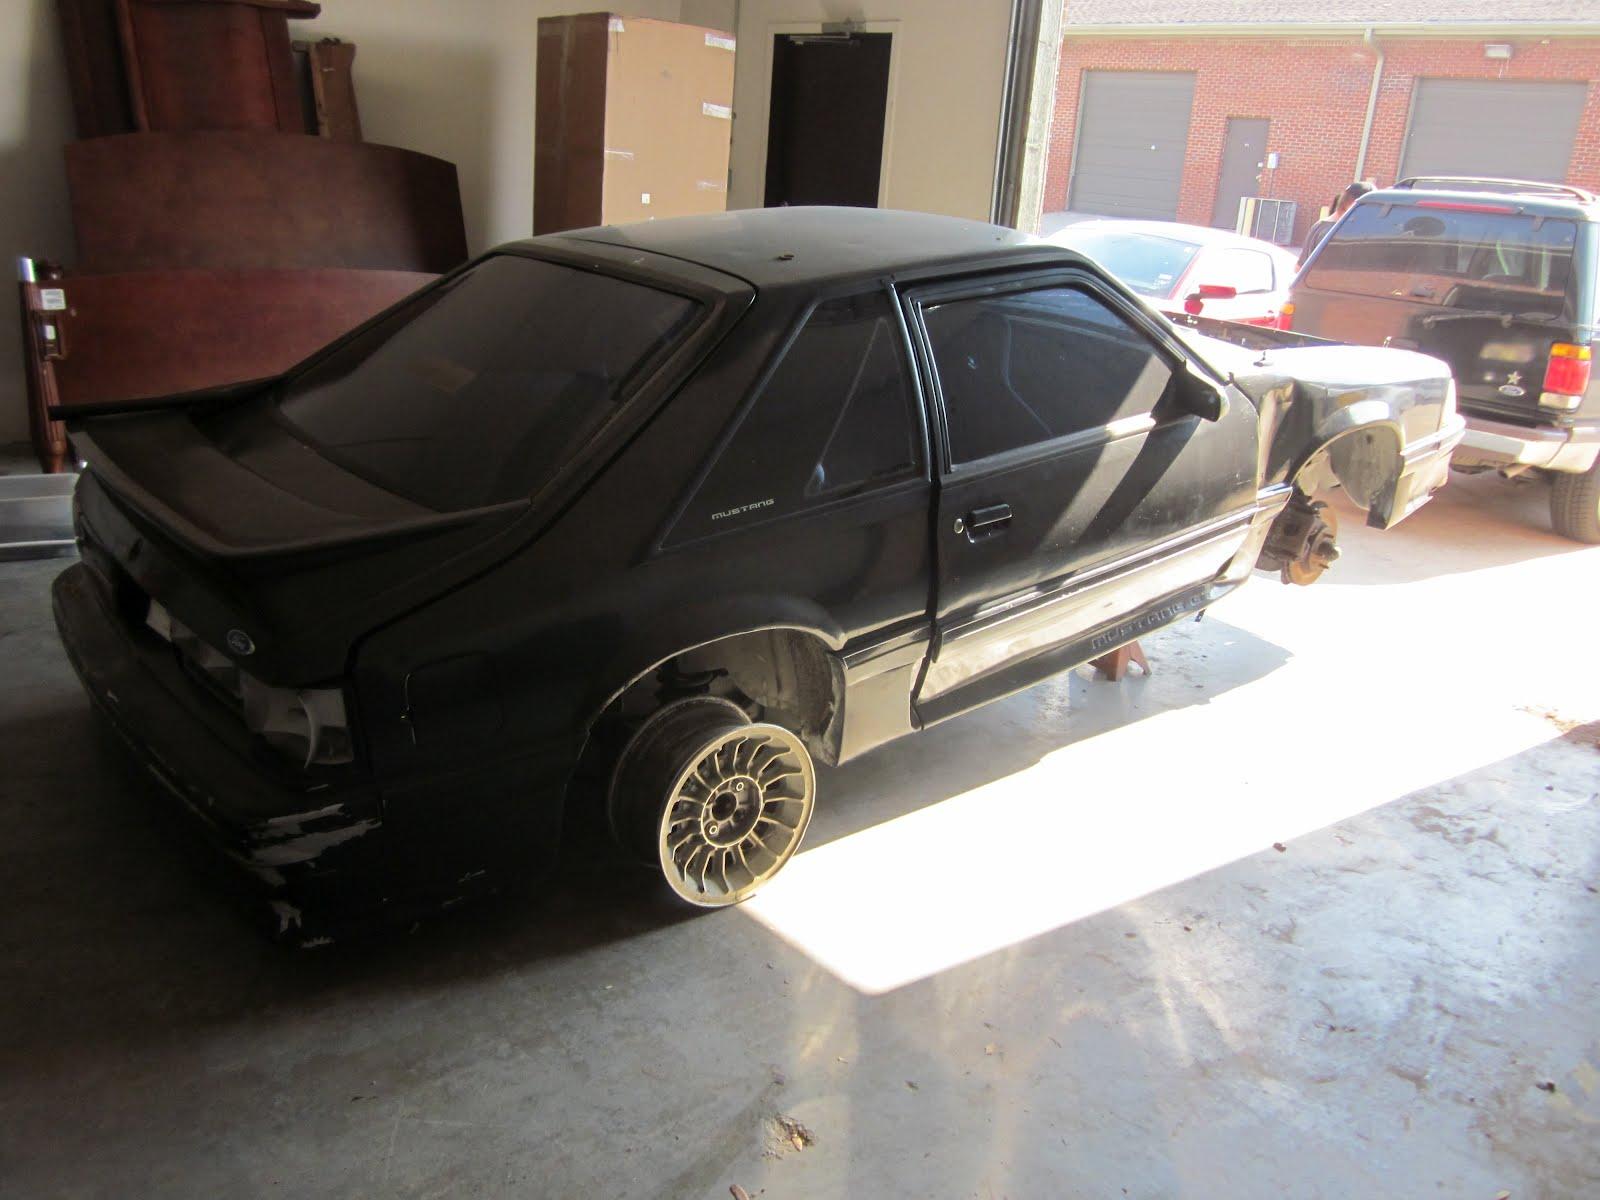 Whiteboy's Mustangs: (HATER MAKER) 1990 GT $100 deal!!